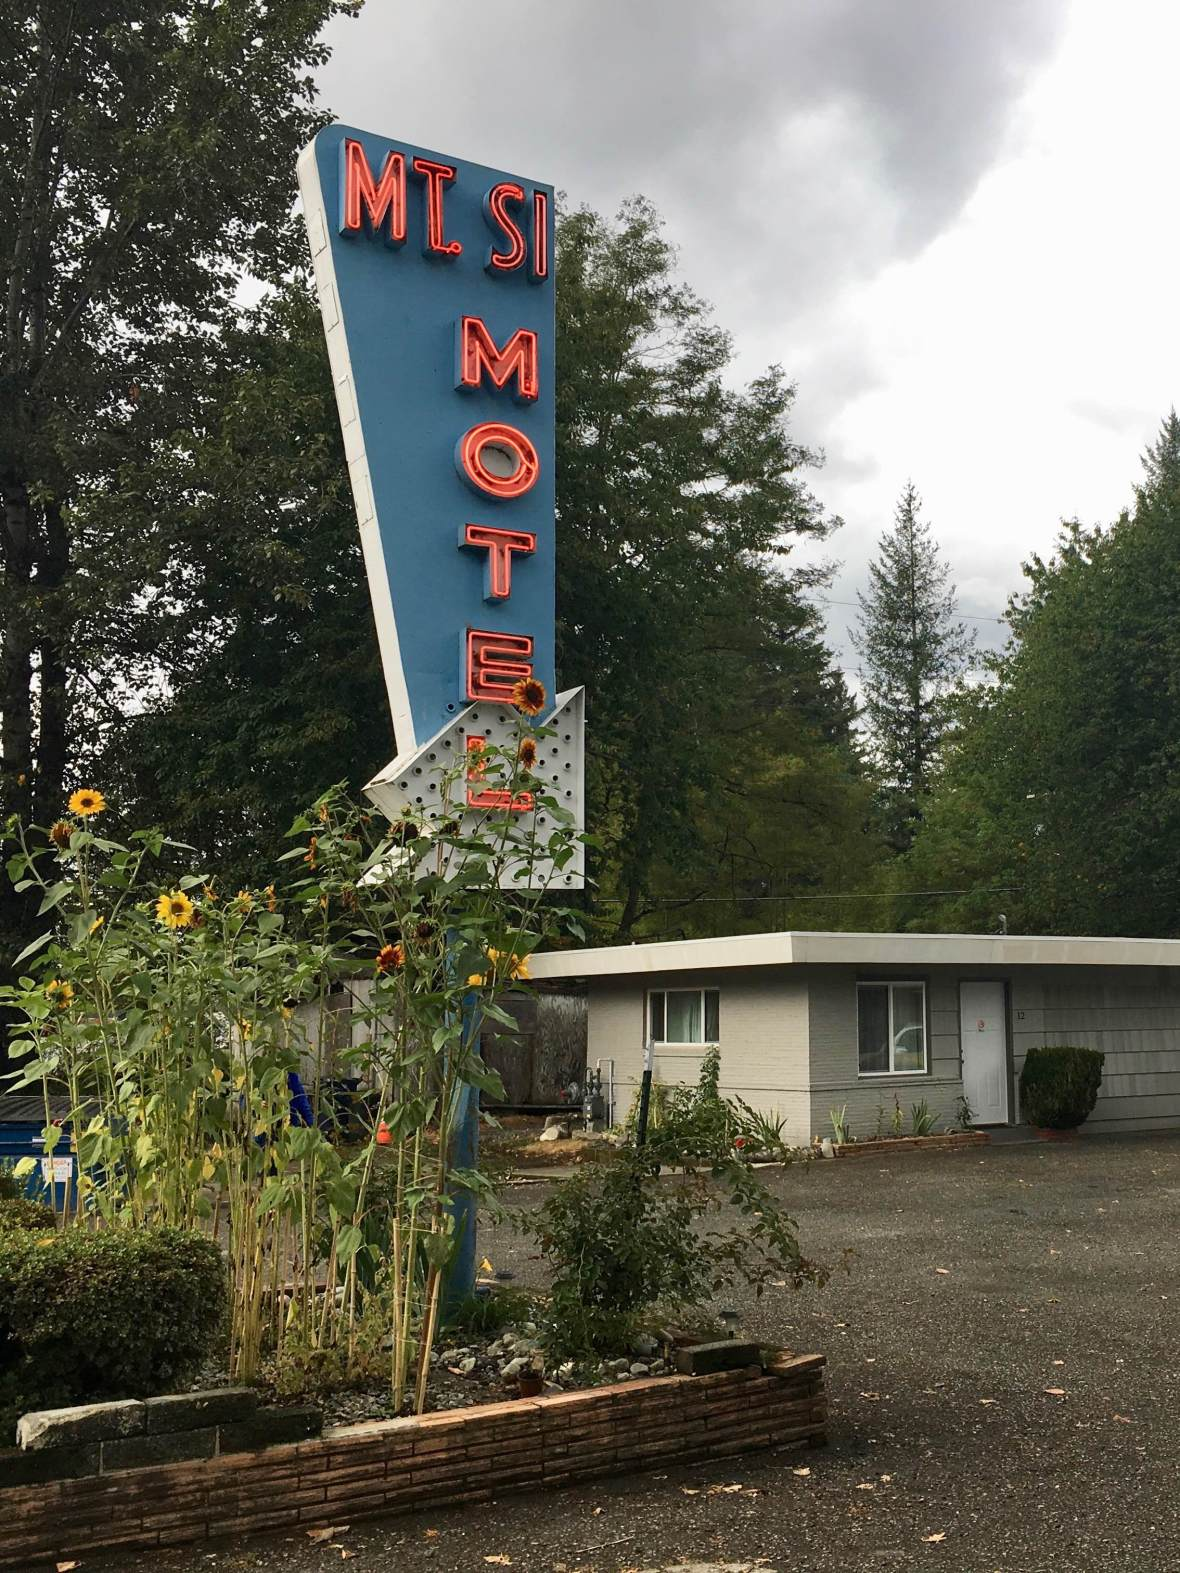 Mt. Si Motel North Bend, Washington - Twin Peaks Filming Location